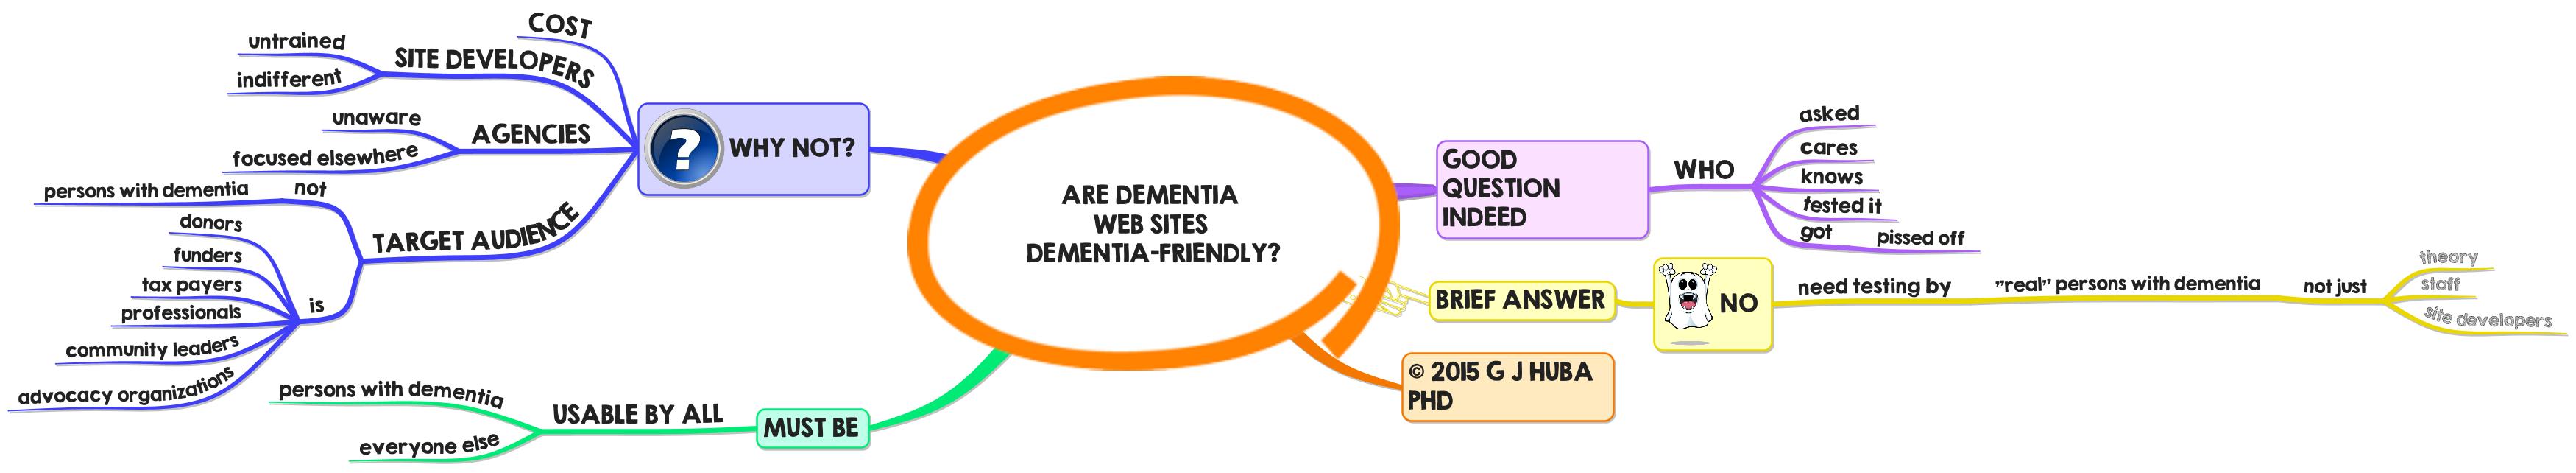 3Are Dementia Web Sites Dementia-Friendly